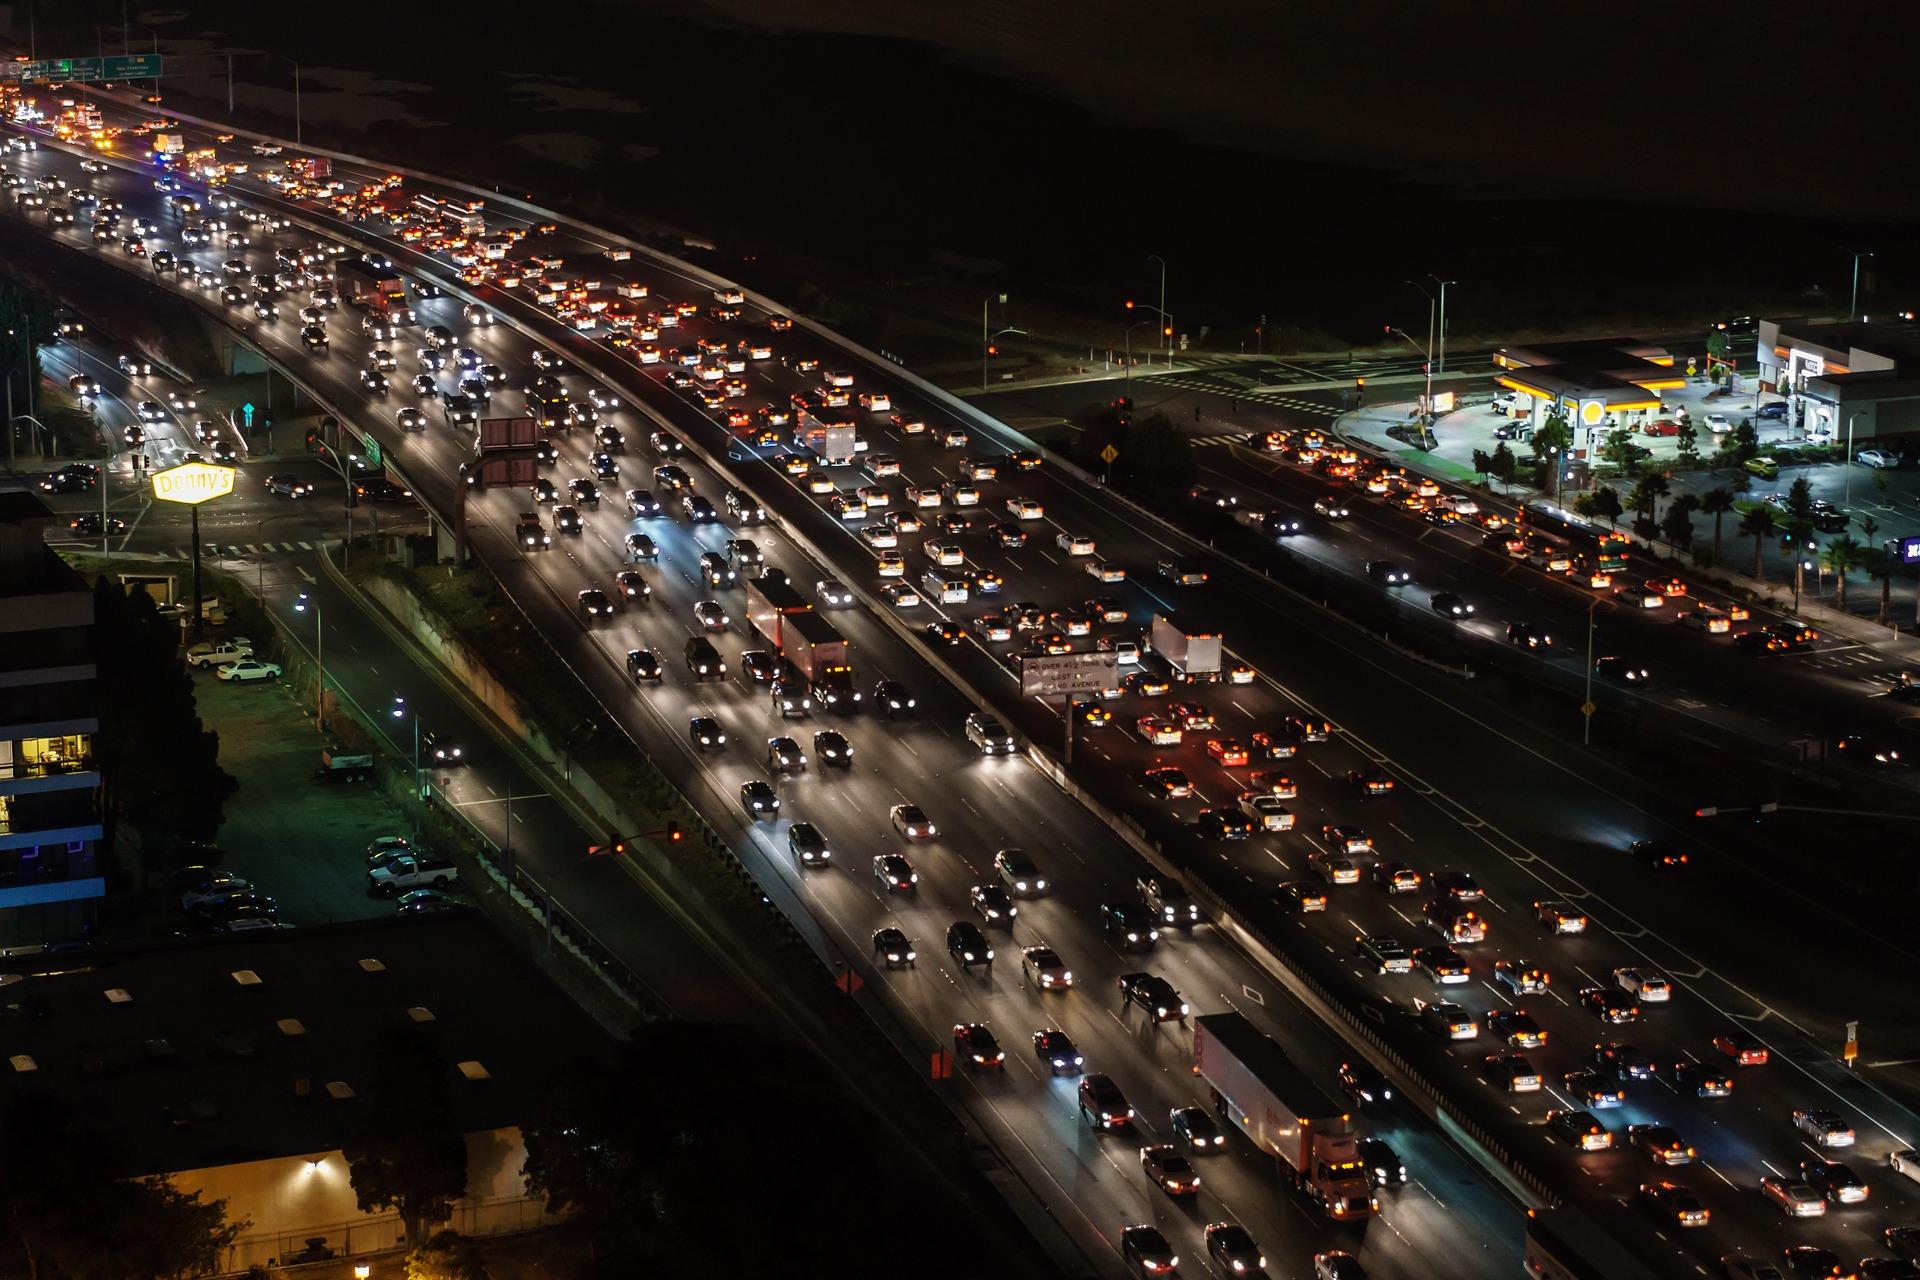 traffic-jam-1703575_1920